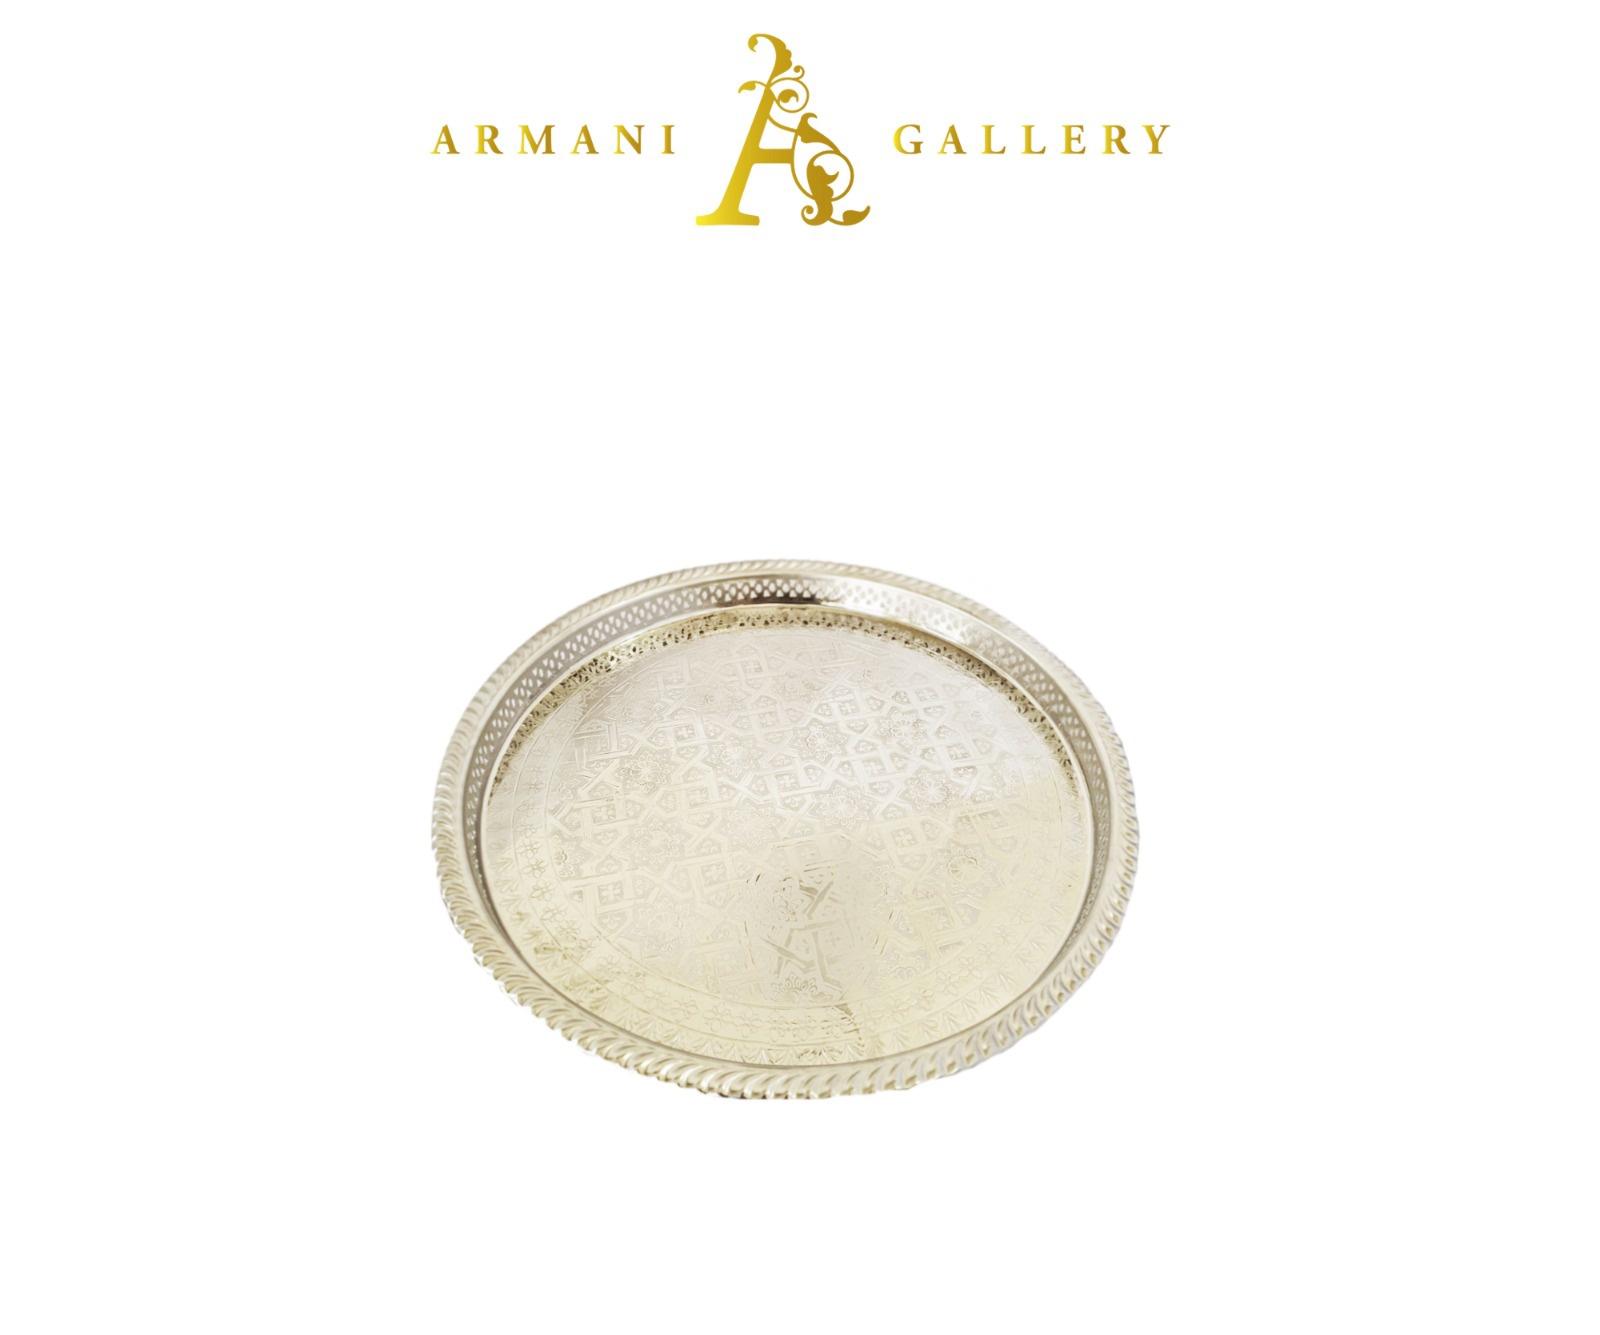 Buy Moroccan Royal Round Tray - Small